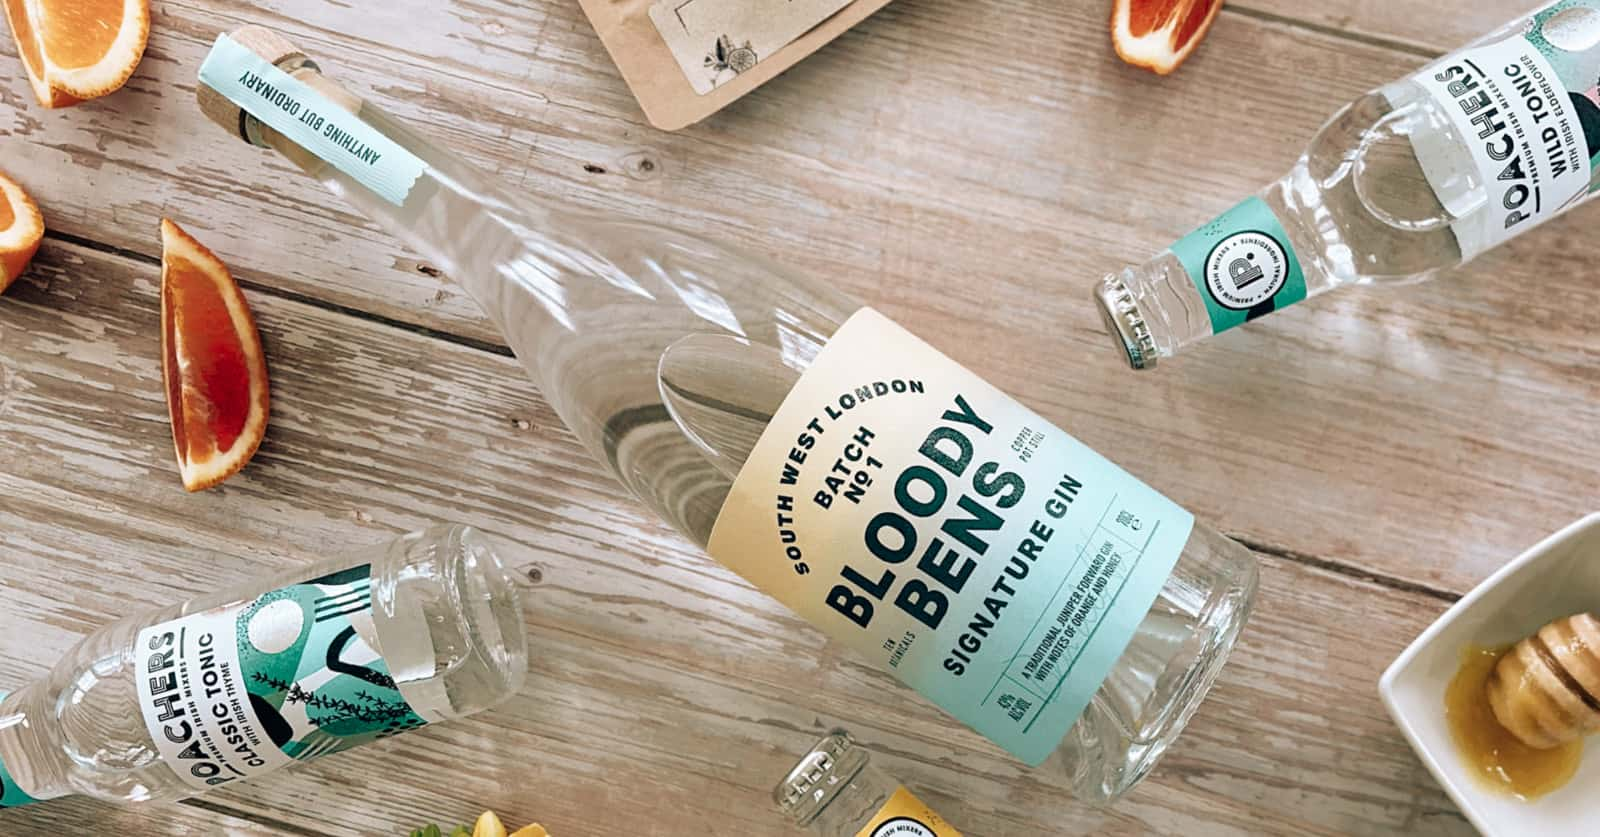 Bloody Bens Gin Flexi-Hex Eco-Friendly Bottle Packaging